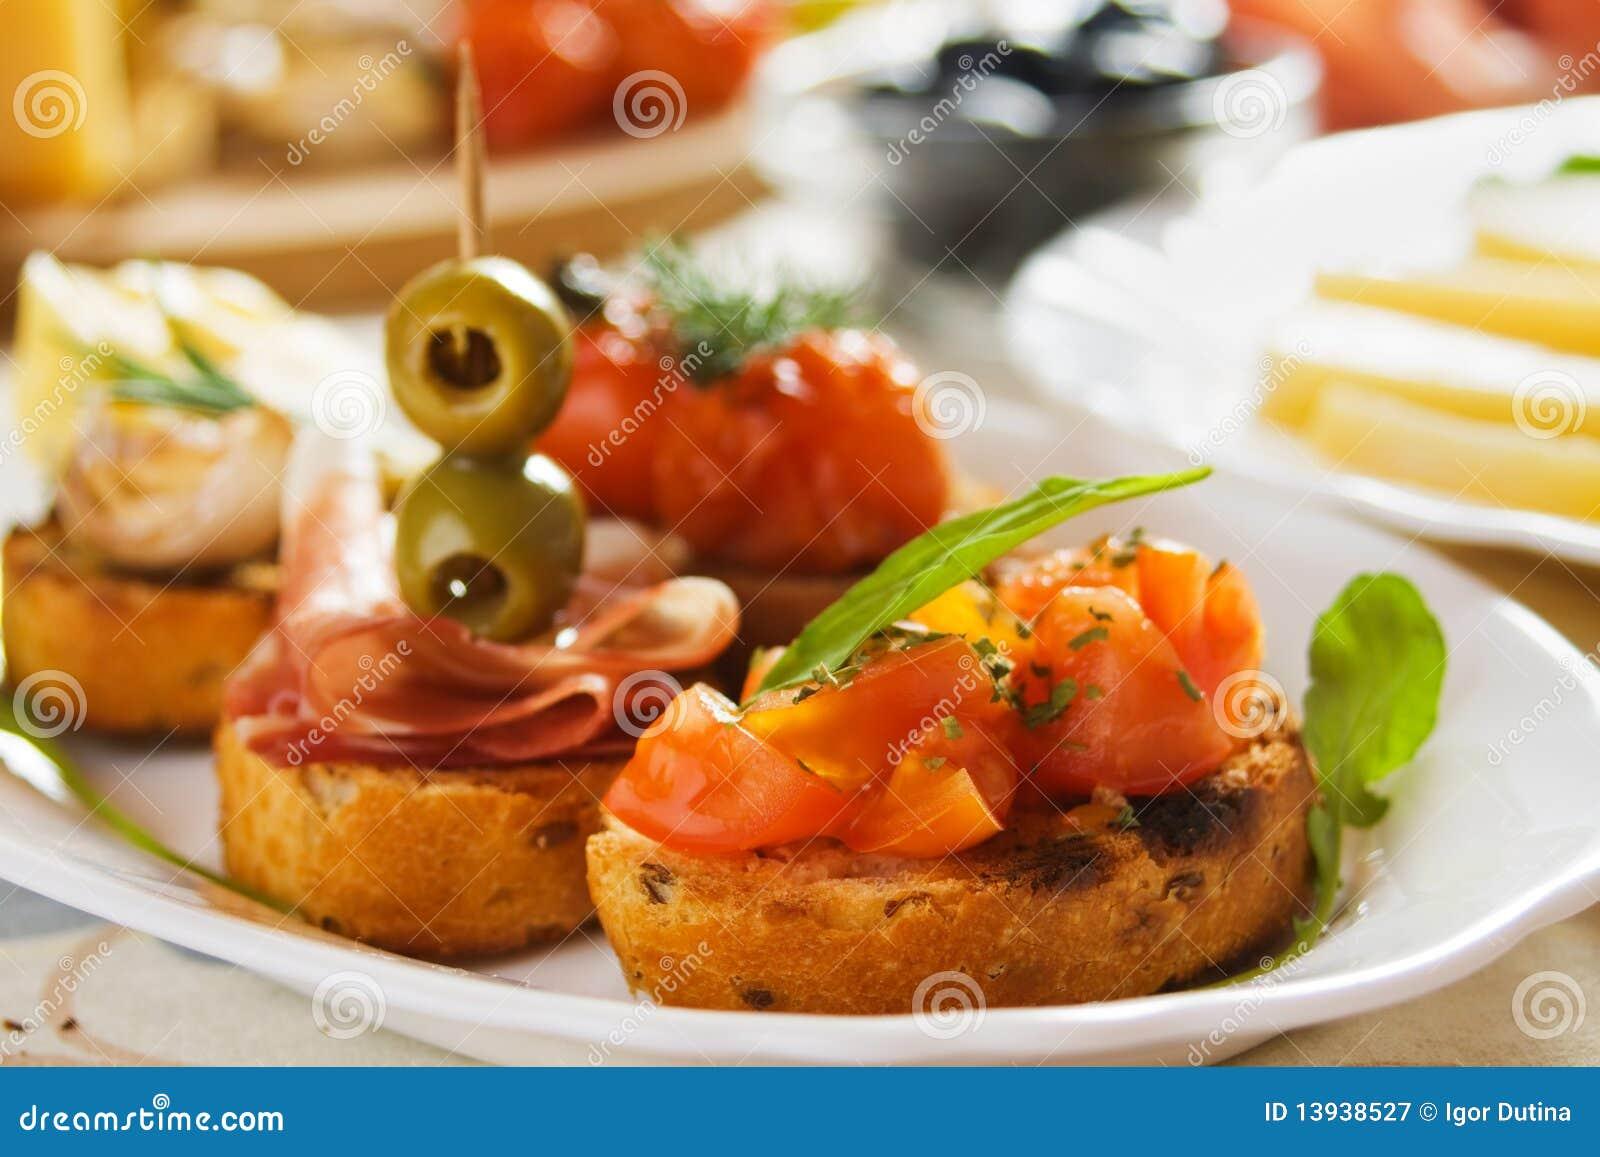 Bruschette with tomato, olives and prosciutto